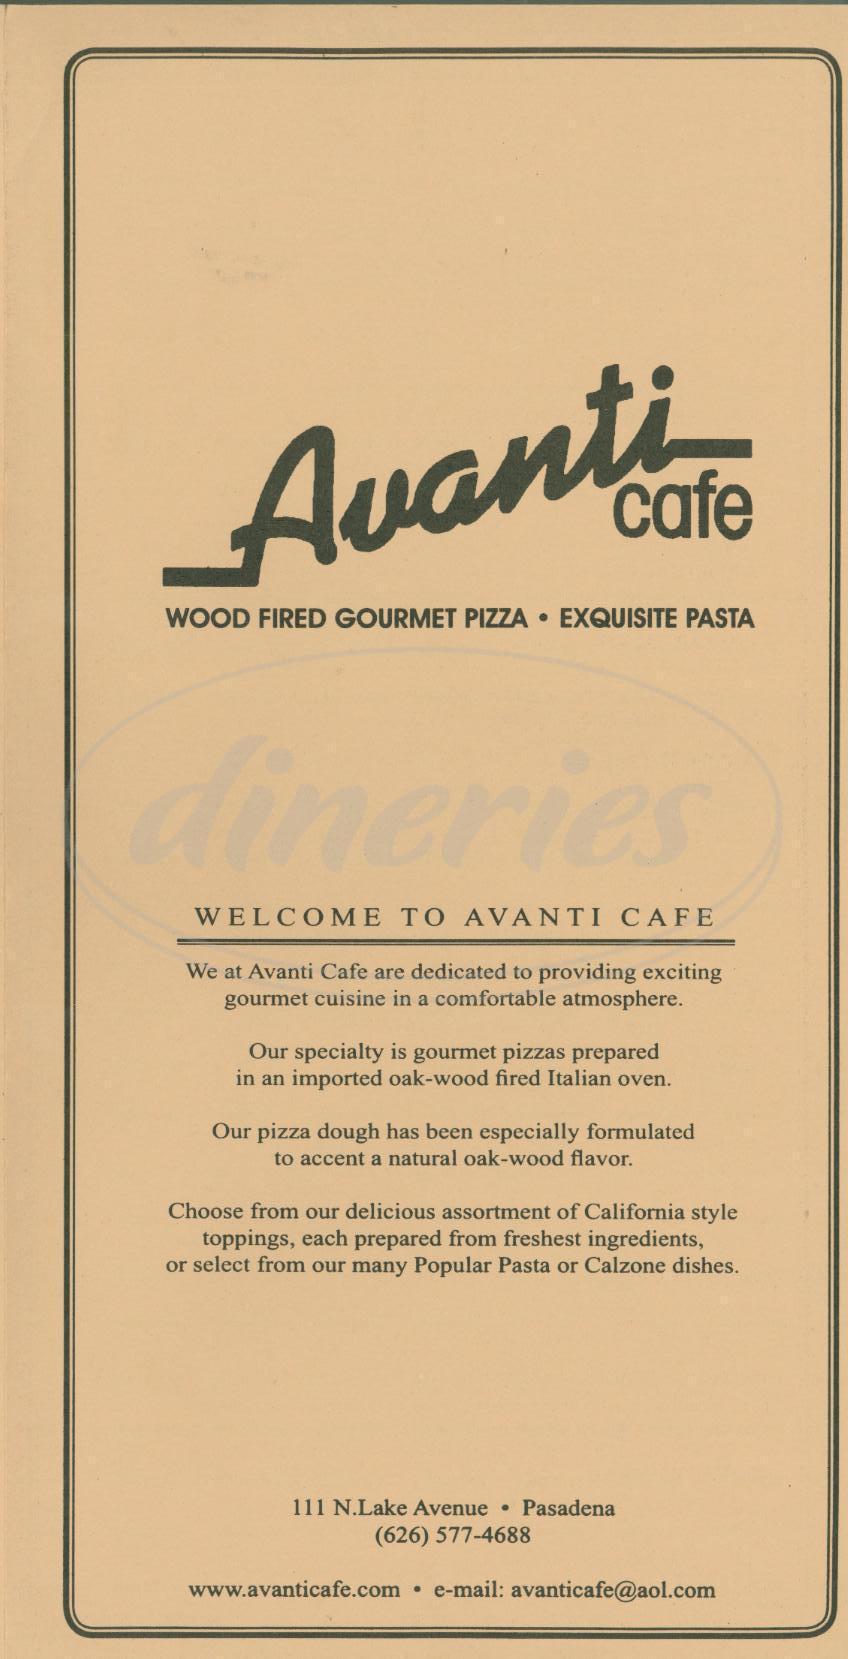 menu for Avanti Café